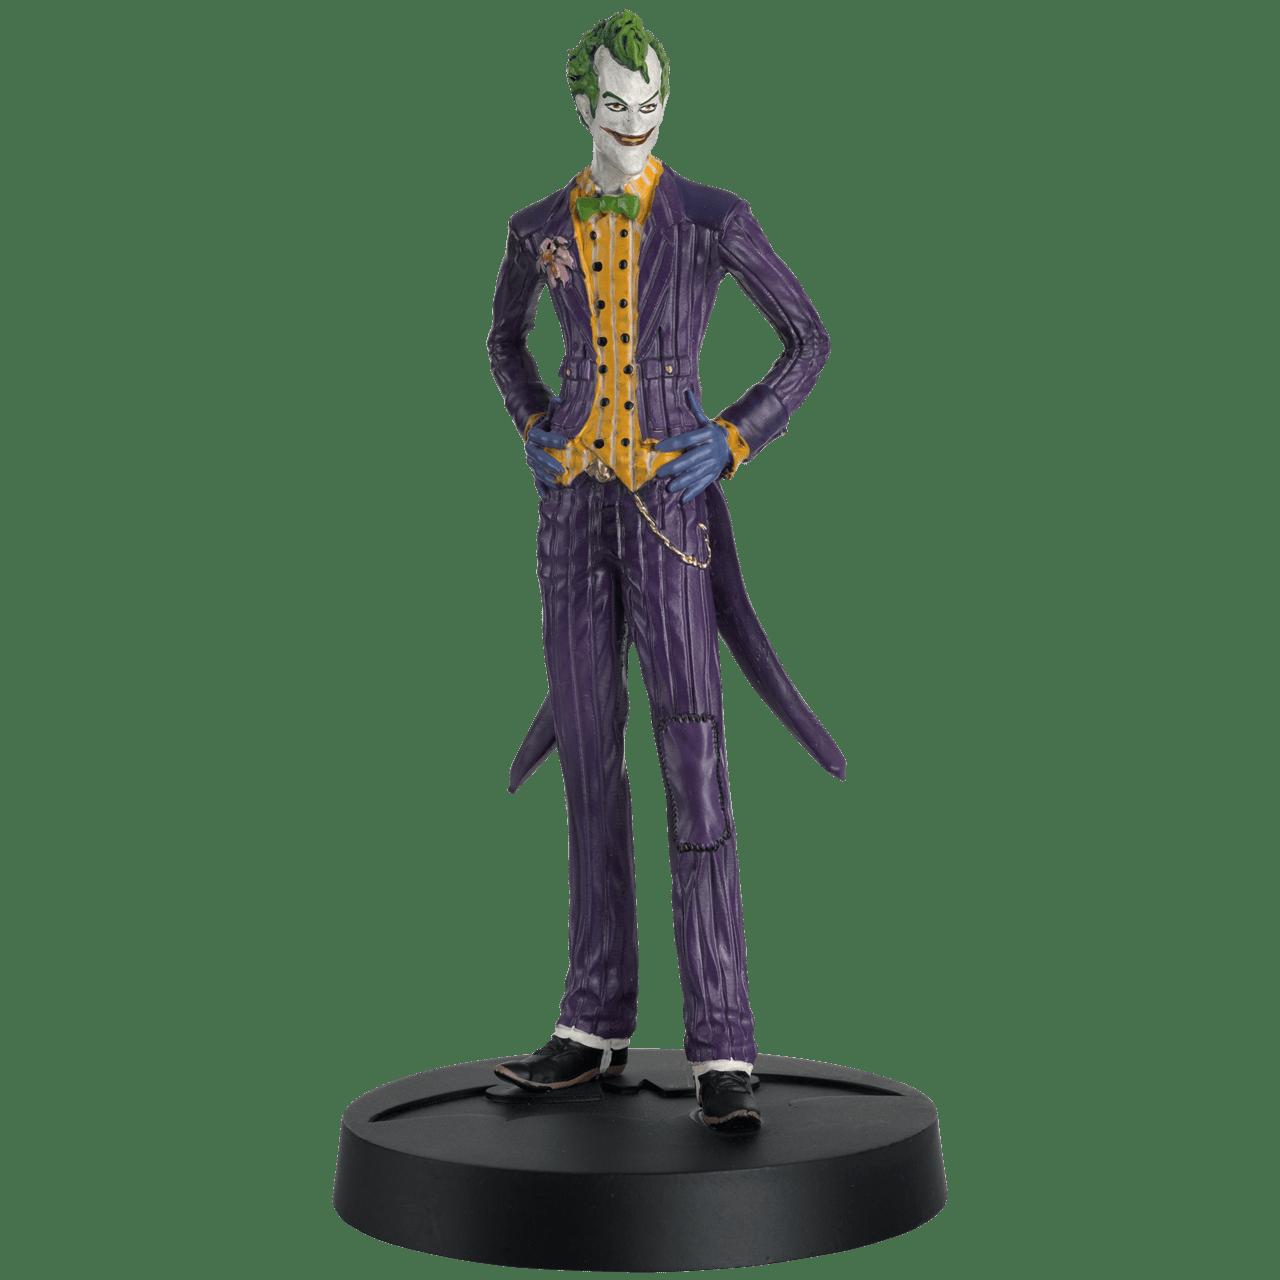 Batman: Arkham Asylum 3 Figurine Set: Batman, Joker, Harley: Hero Collector - 3